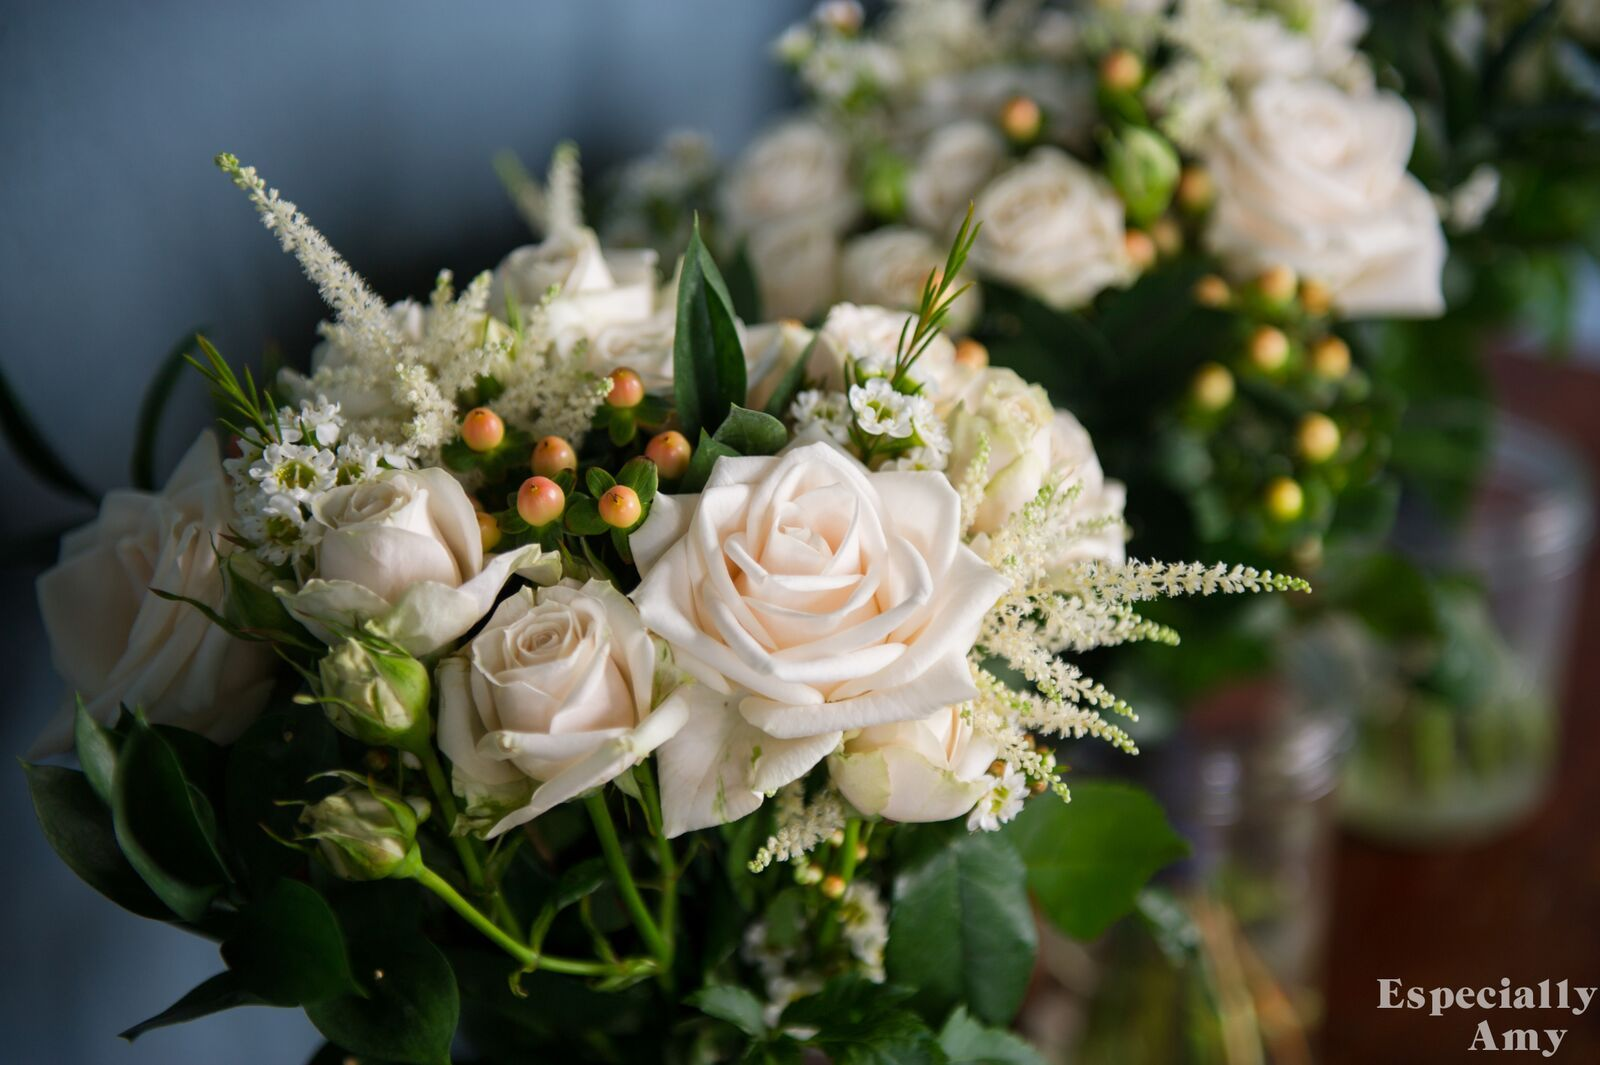 Flowers By Heidi Lee Chateau Rigaud Bordeaux Flowers Wedding Flowers Floral Arrangements